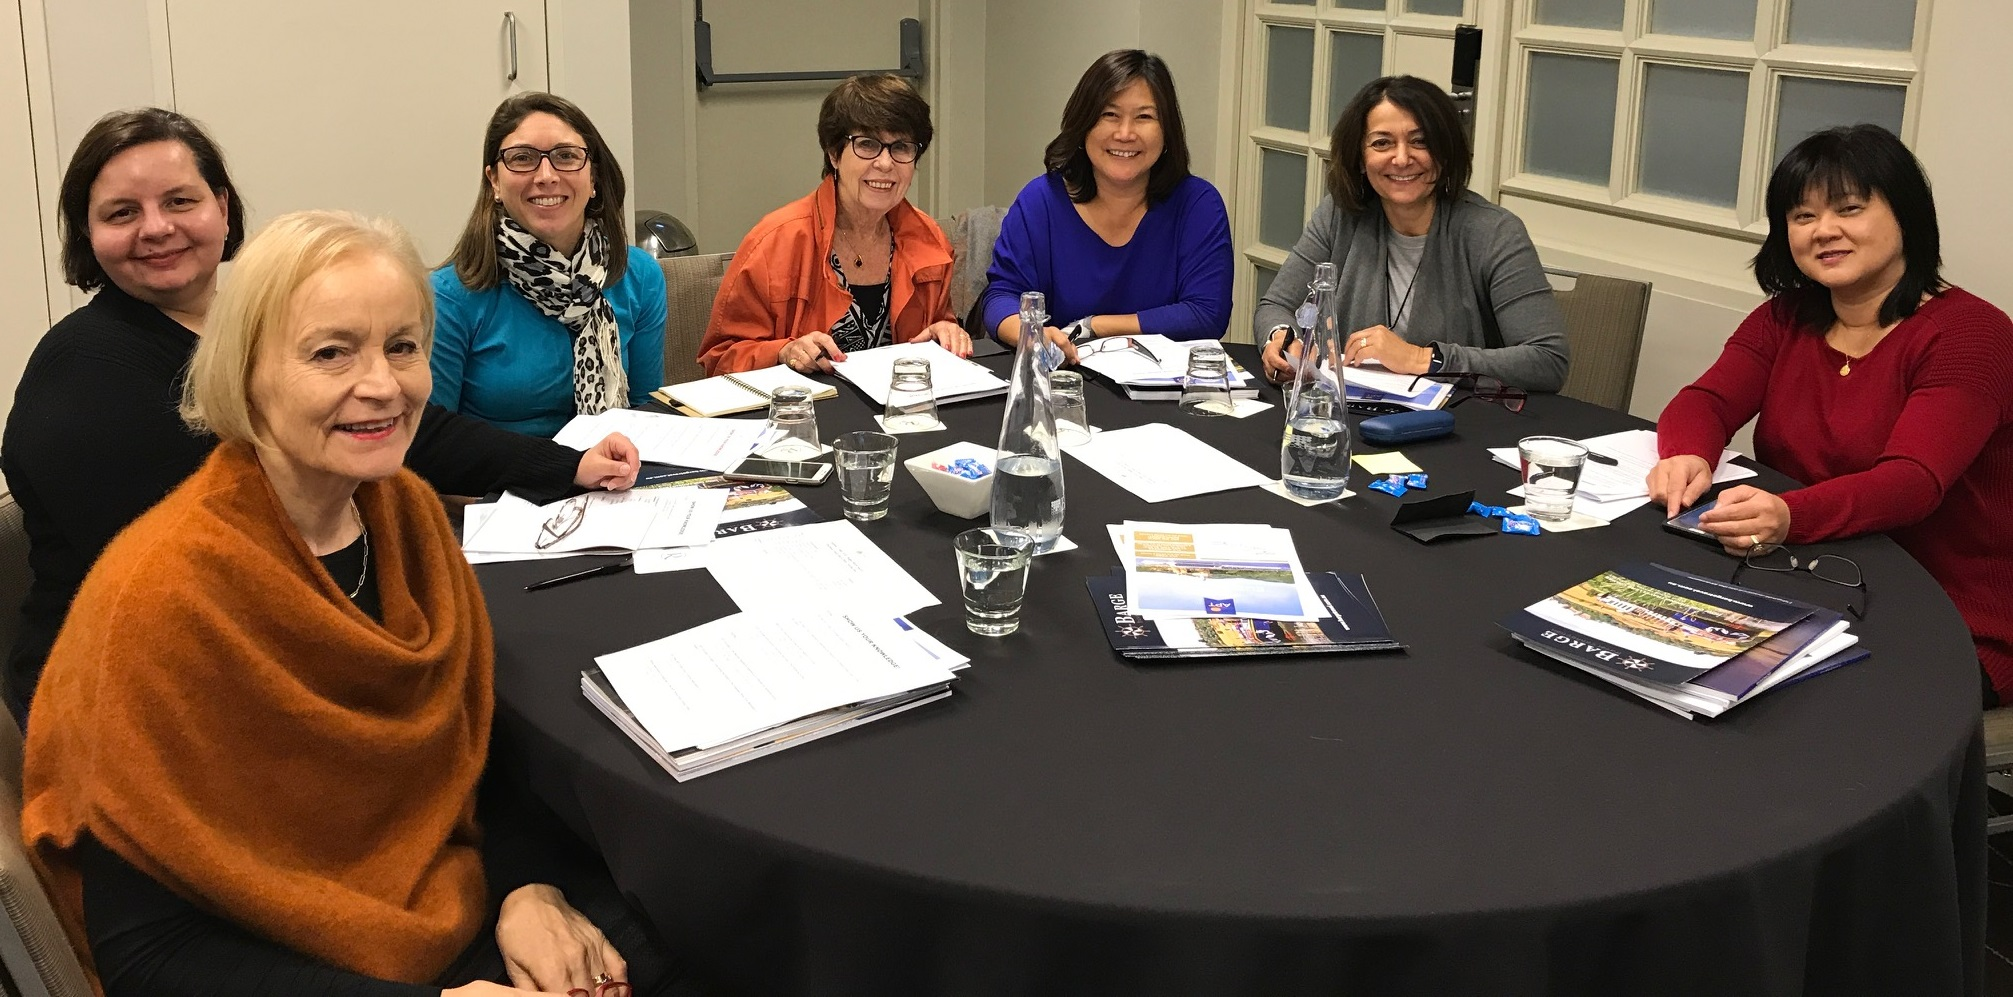 (L-R) Personal travel managers Lyn Tyson, Maria Furnari, Danielle Goncalves, Beverly Burt, Alma Araullo, Sue Kuti and Teresa Reyes